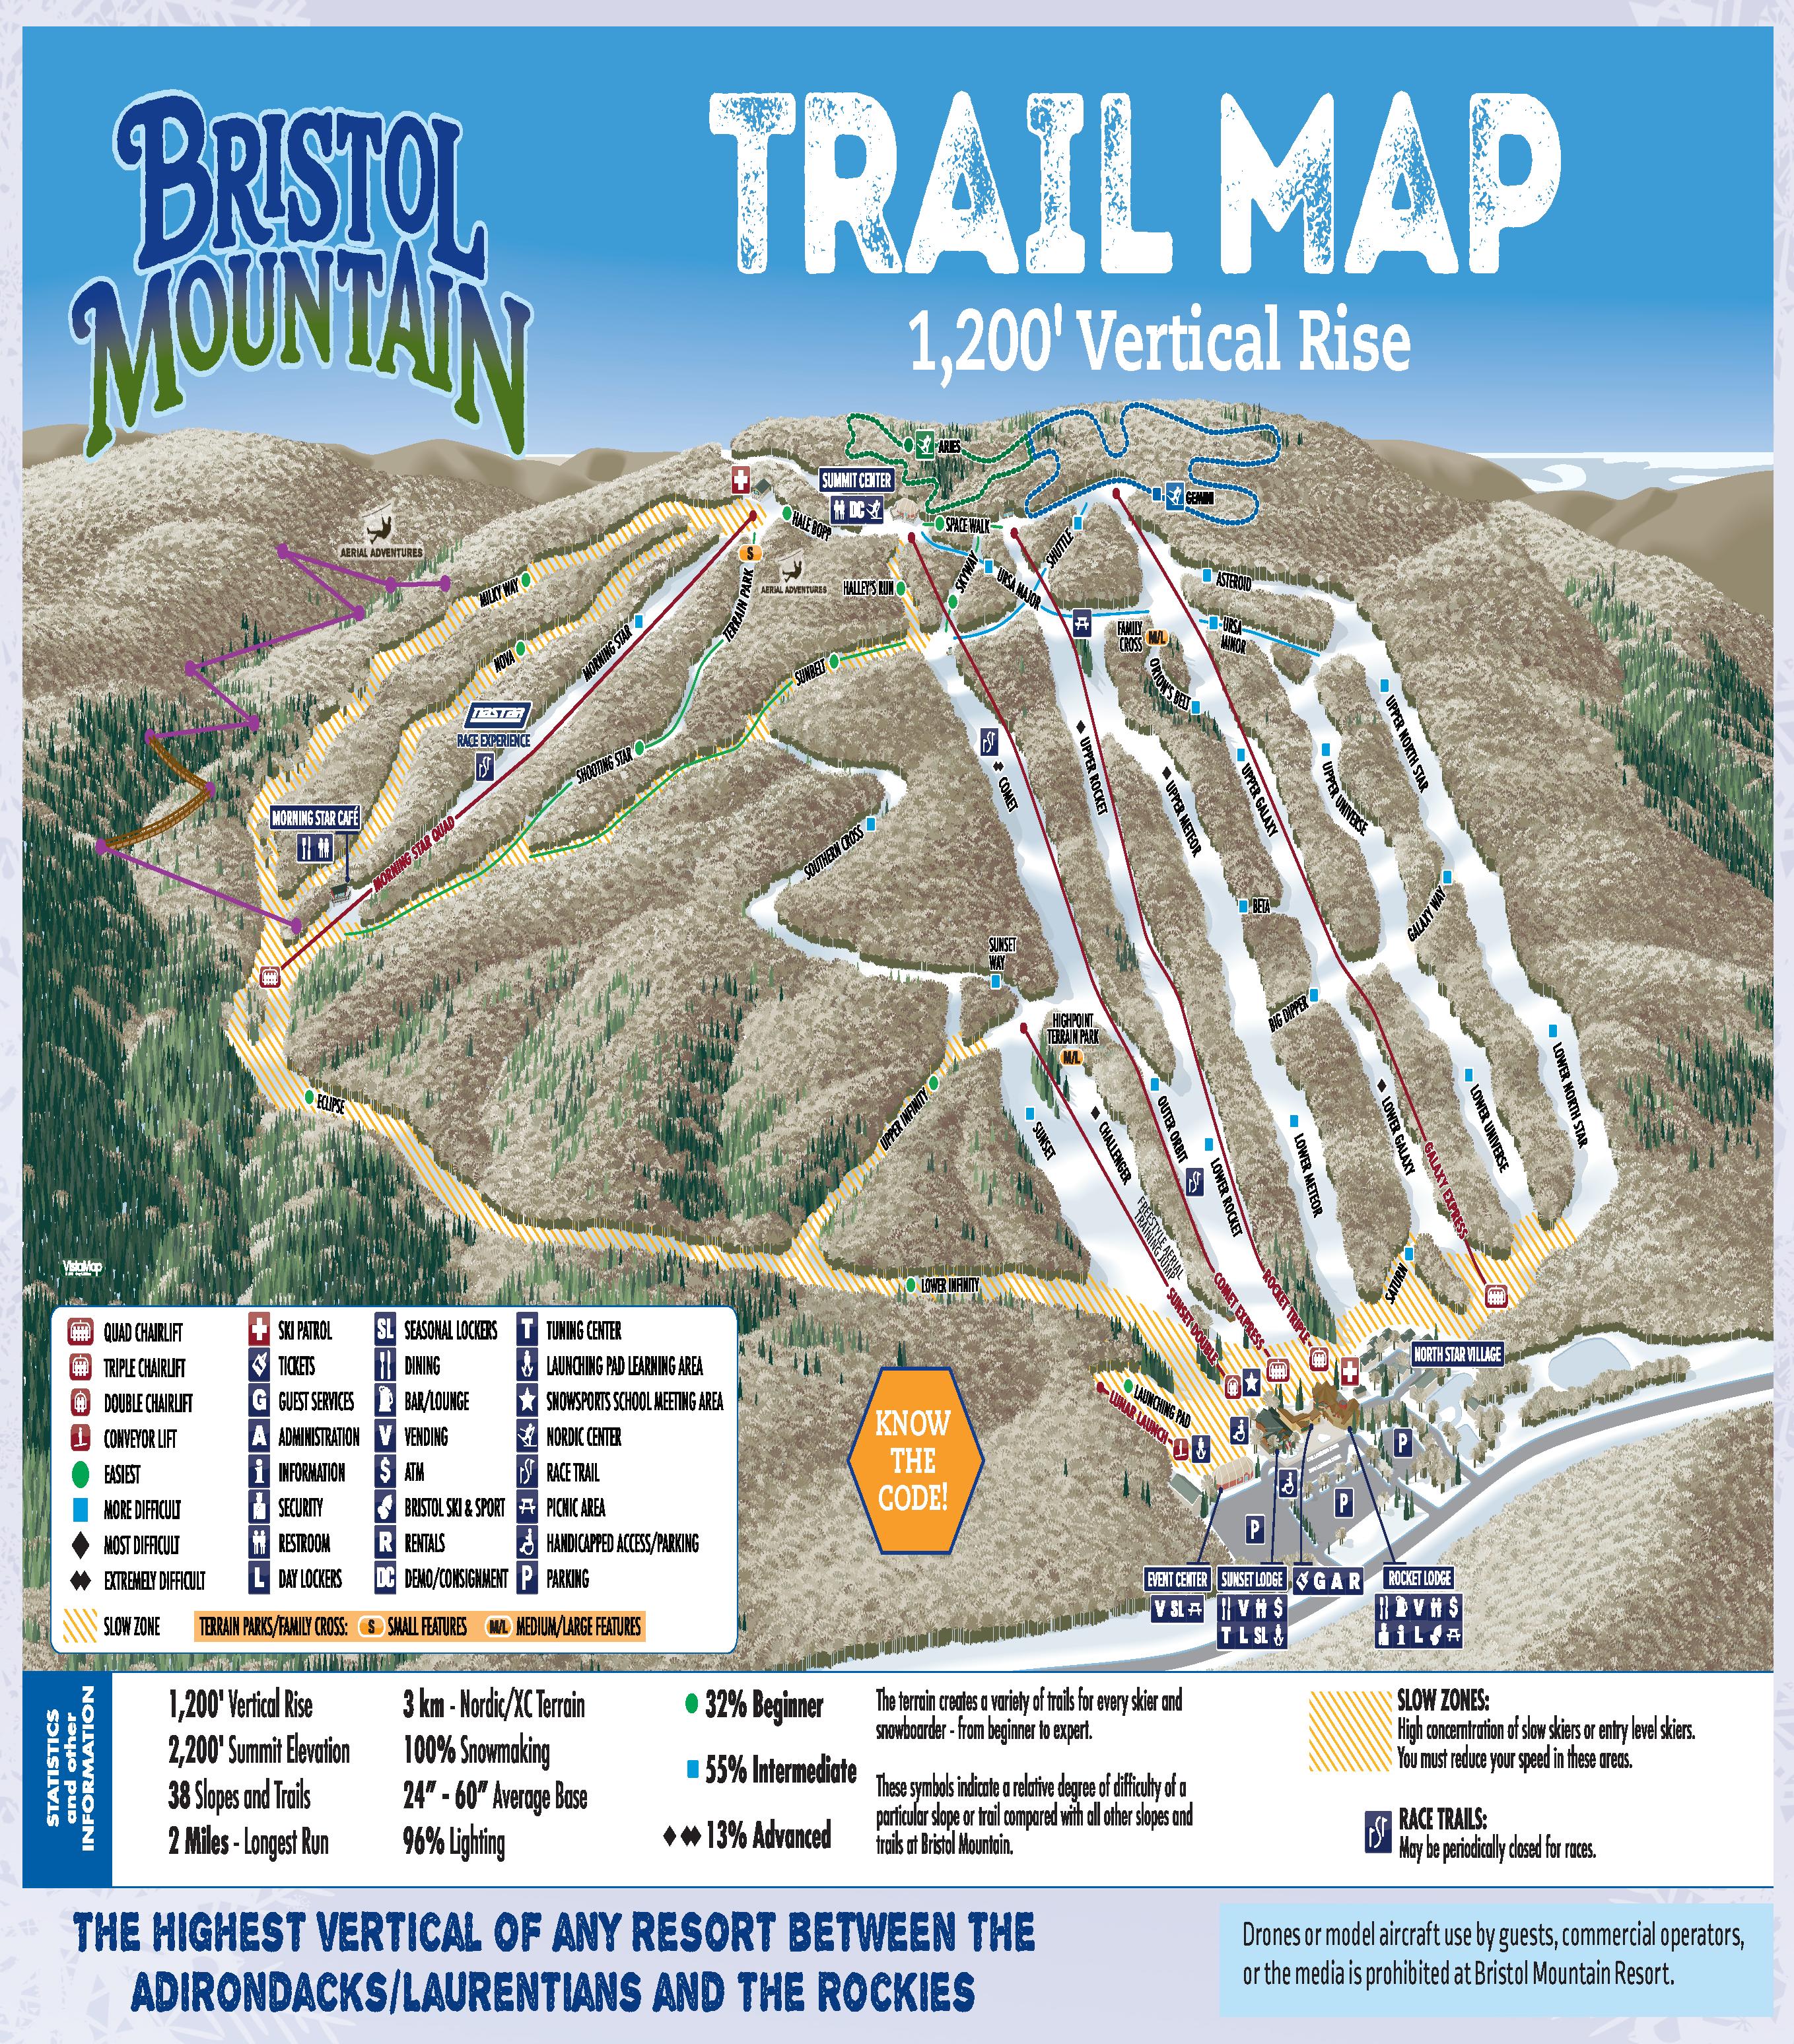 bristol mountaintrail map 2018-19 png - bristol mountain